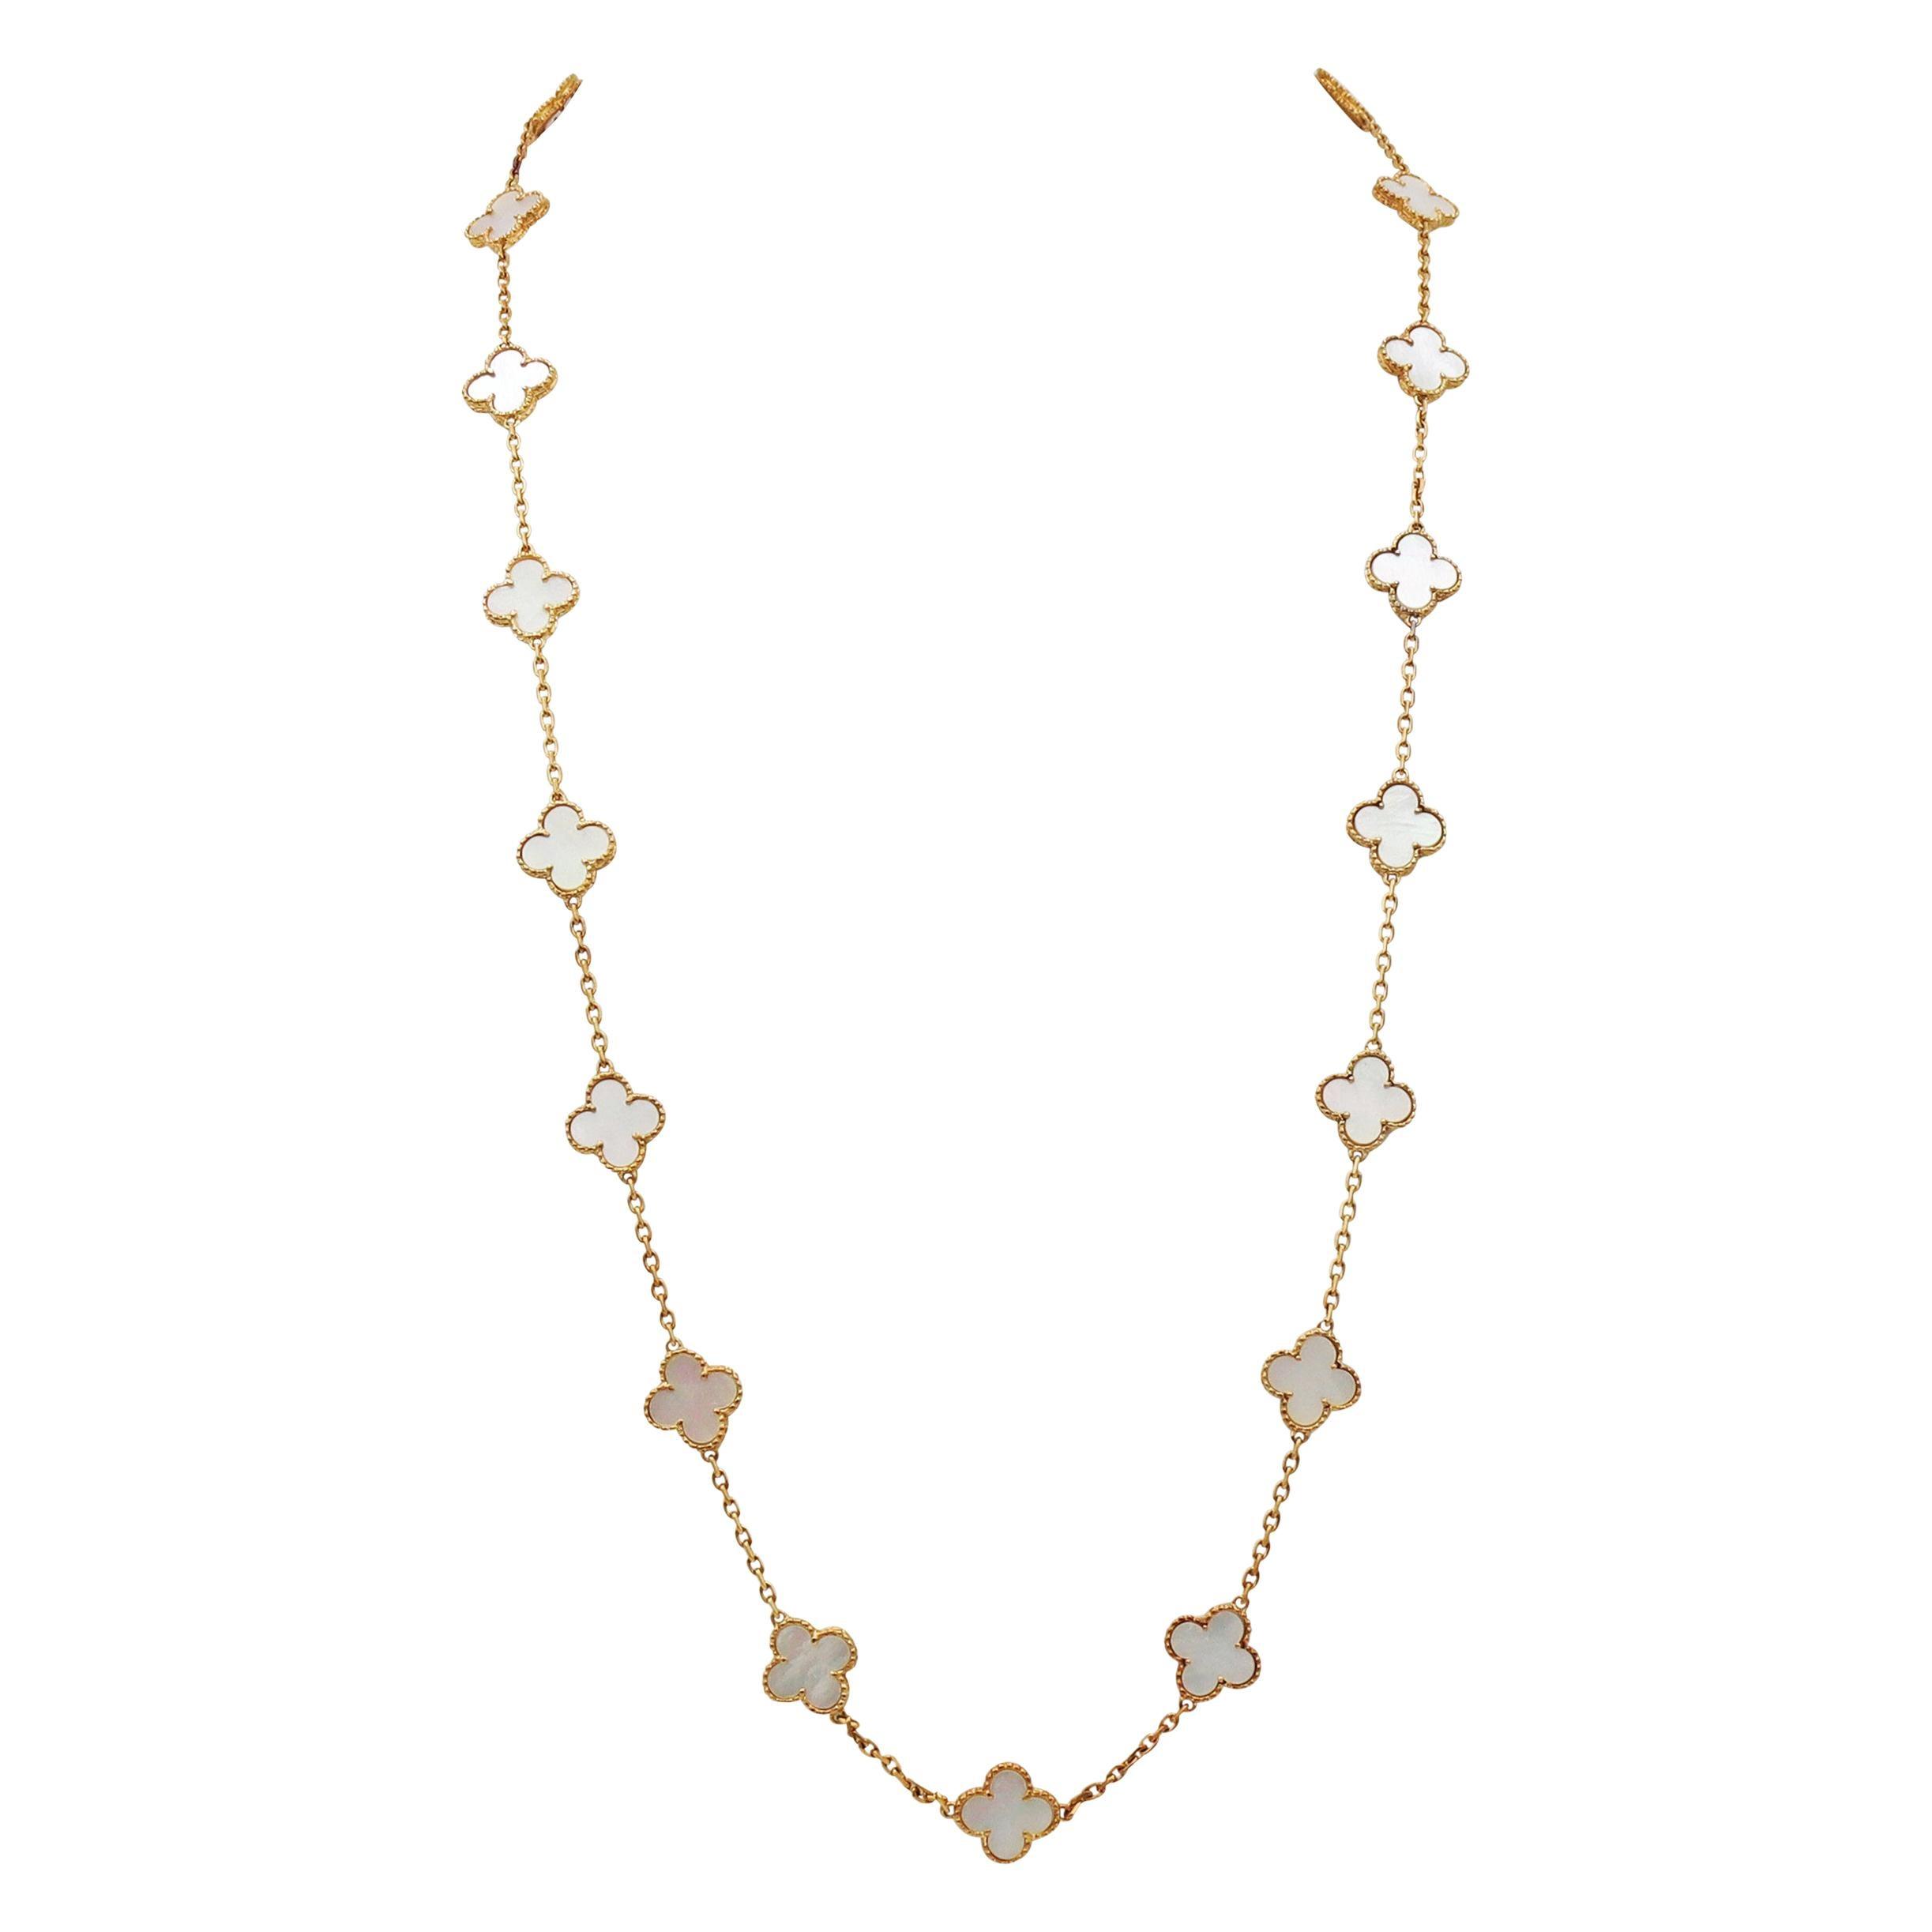 Van Cleef & Arpels Vintage Alhambra 20 Motif Mother of Pearl Necklace